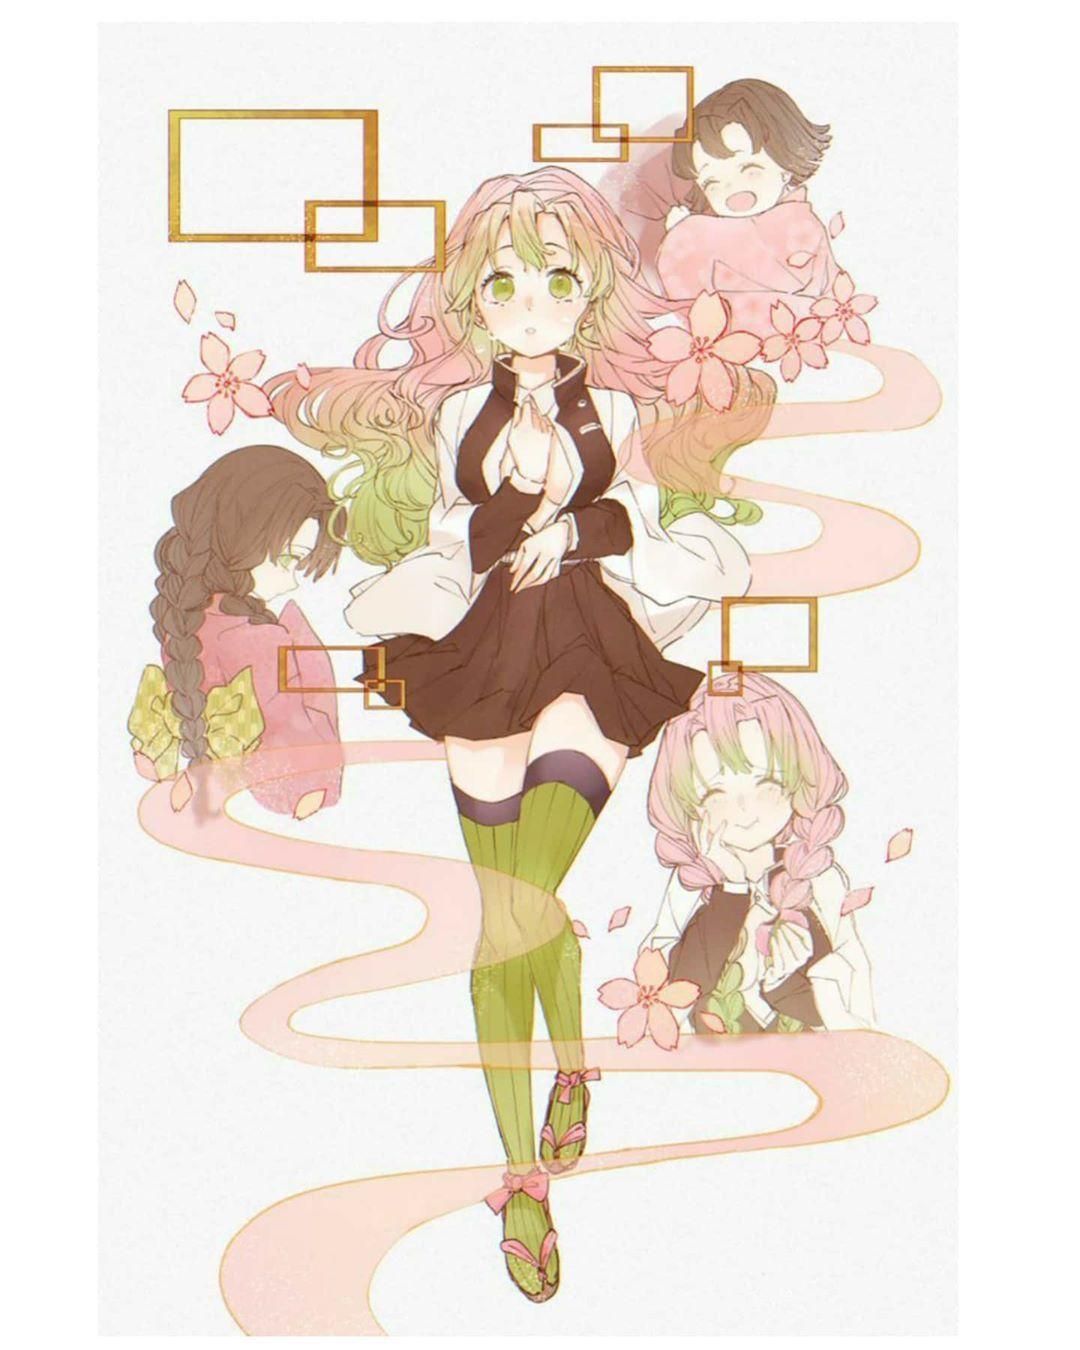 Н¦ð¢ðð¬ð®ð«ð¢ Н¤ðšð§ð«ð¨ð£ð¢ On Instagram Little Mitsuri Credit Sinonomepomu On Twitte Anime Demon Kawaii Anime Slayer Anime The following tags are aliased to this tag: anime demon kawaii anime slayer anime